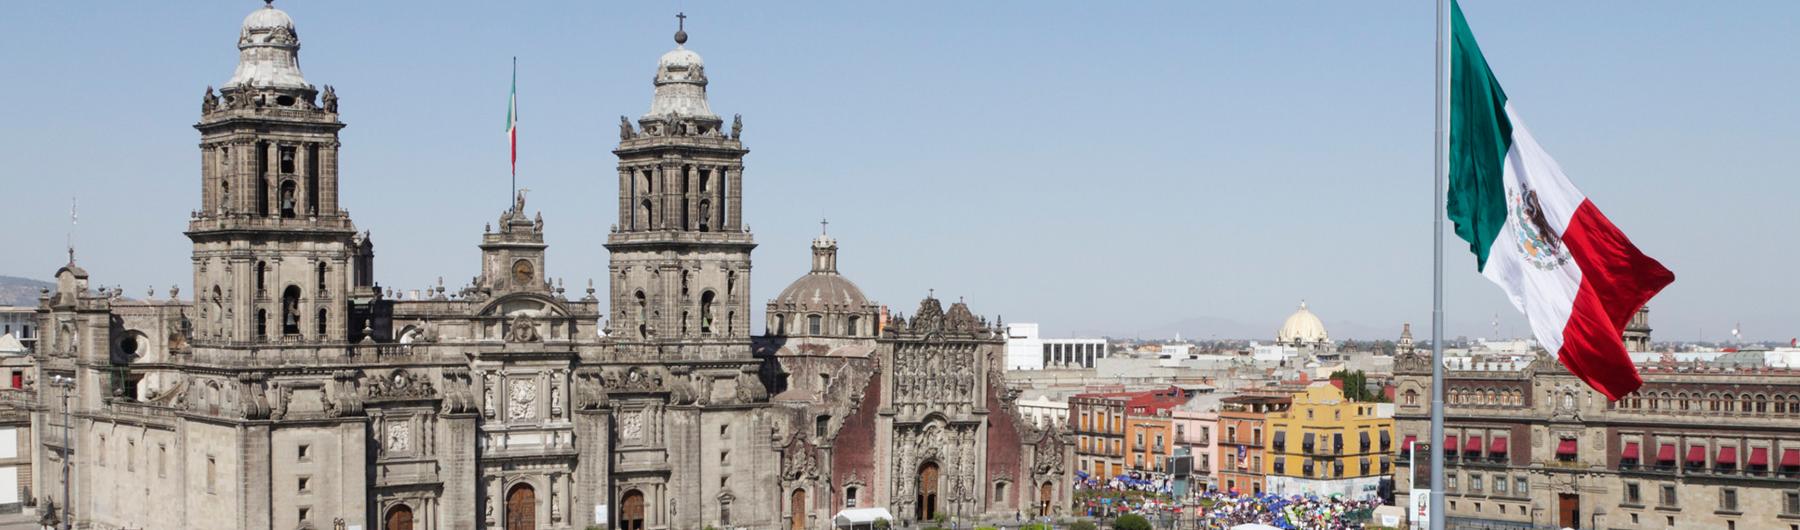 Shopify en México: Ciudad de México